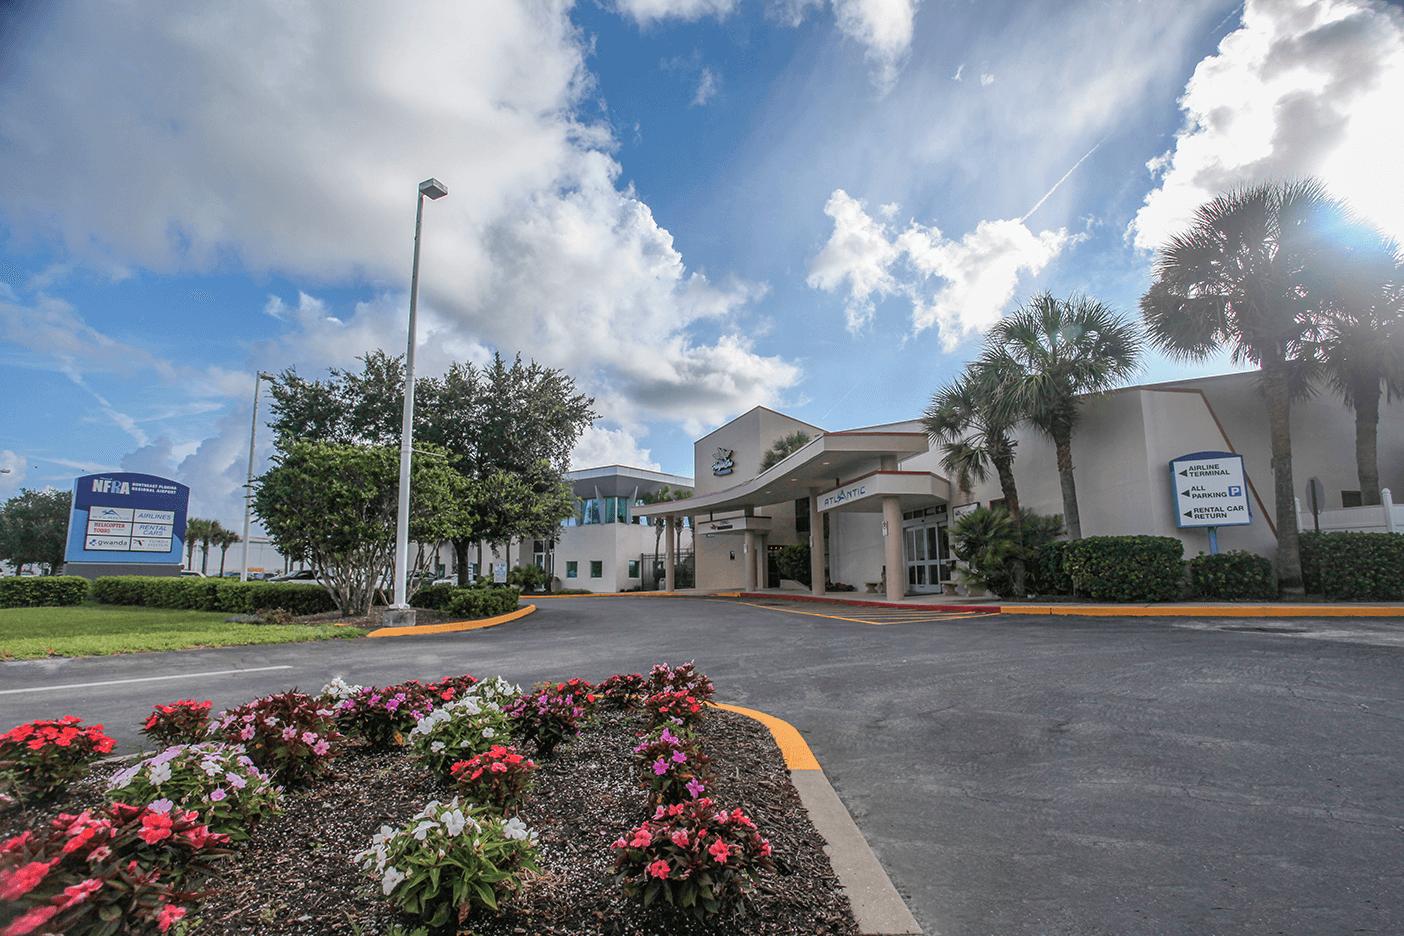 Northeast Florida Regional Airport exterior